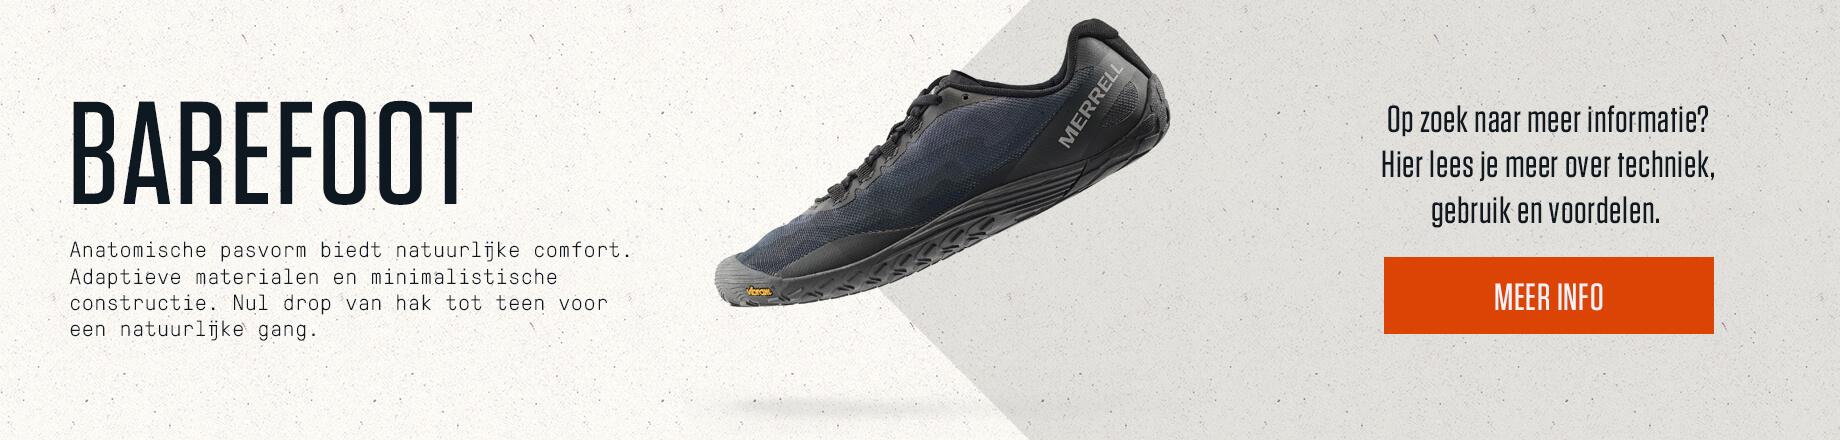 Merrell barefoot shoe.